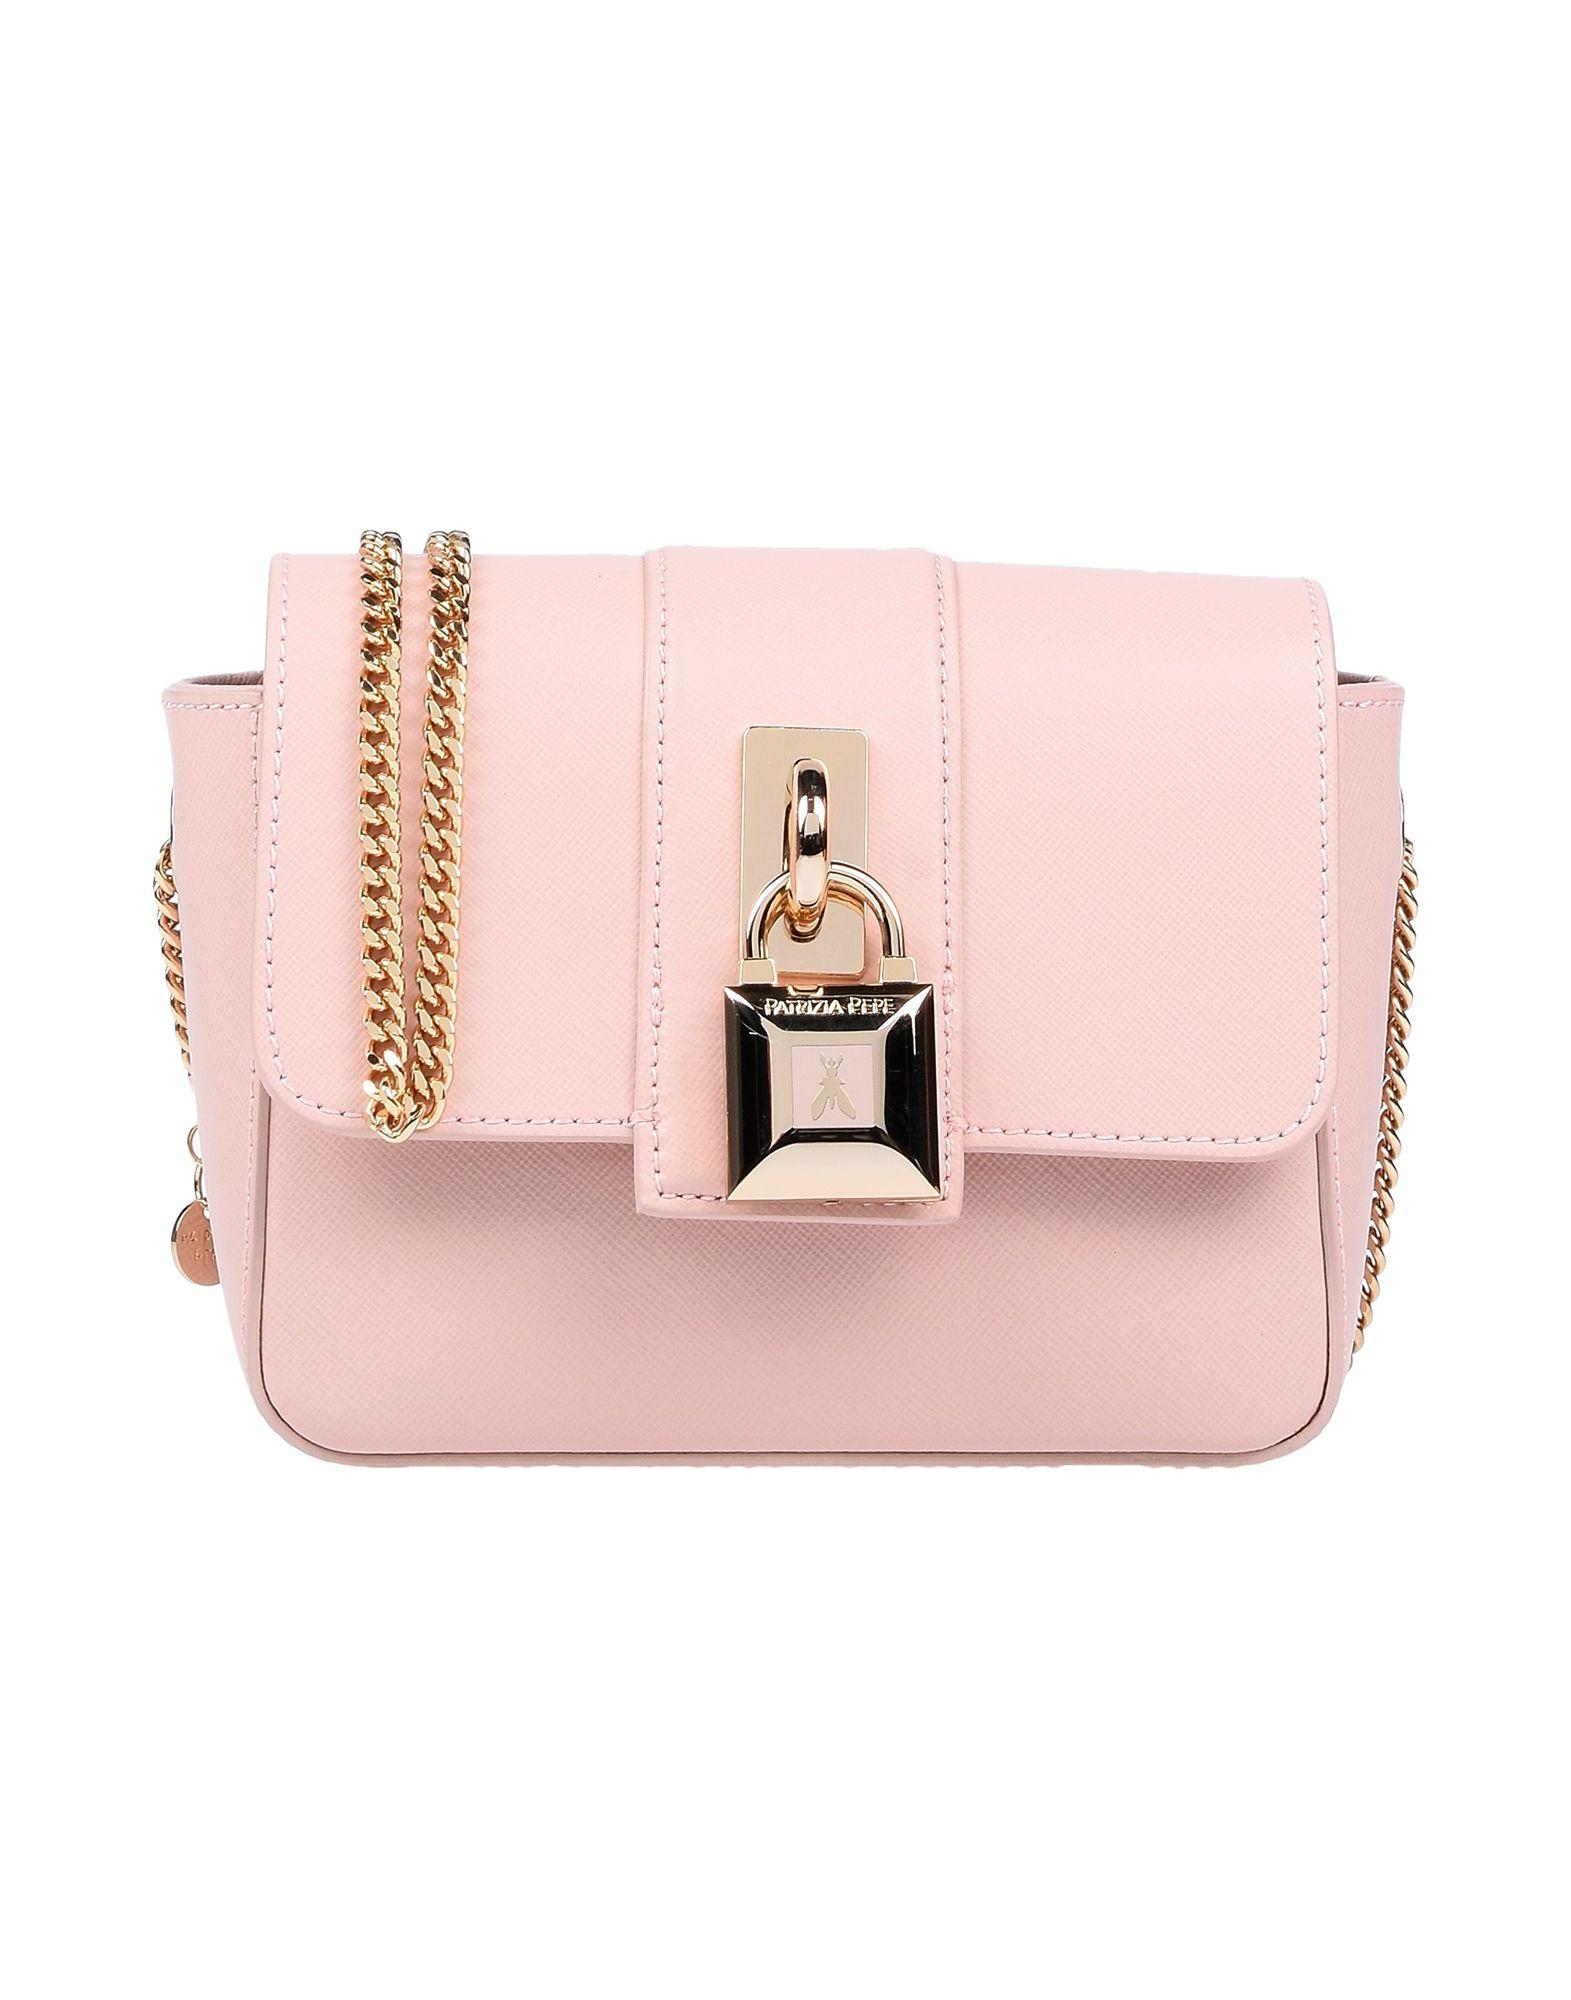 Patrizia Pepe Handbags In Pale Pink  6cc3a88712b86